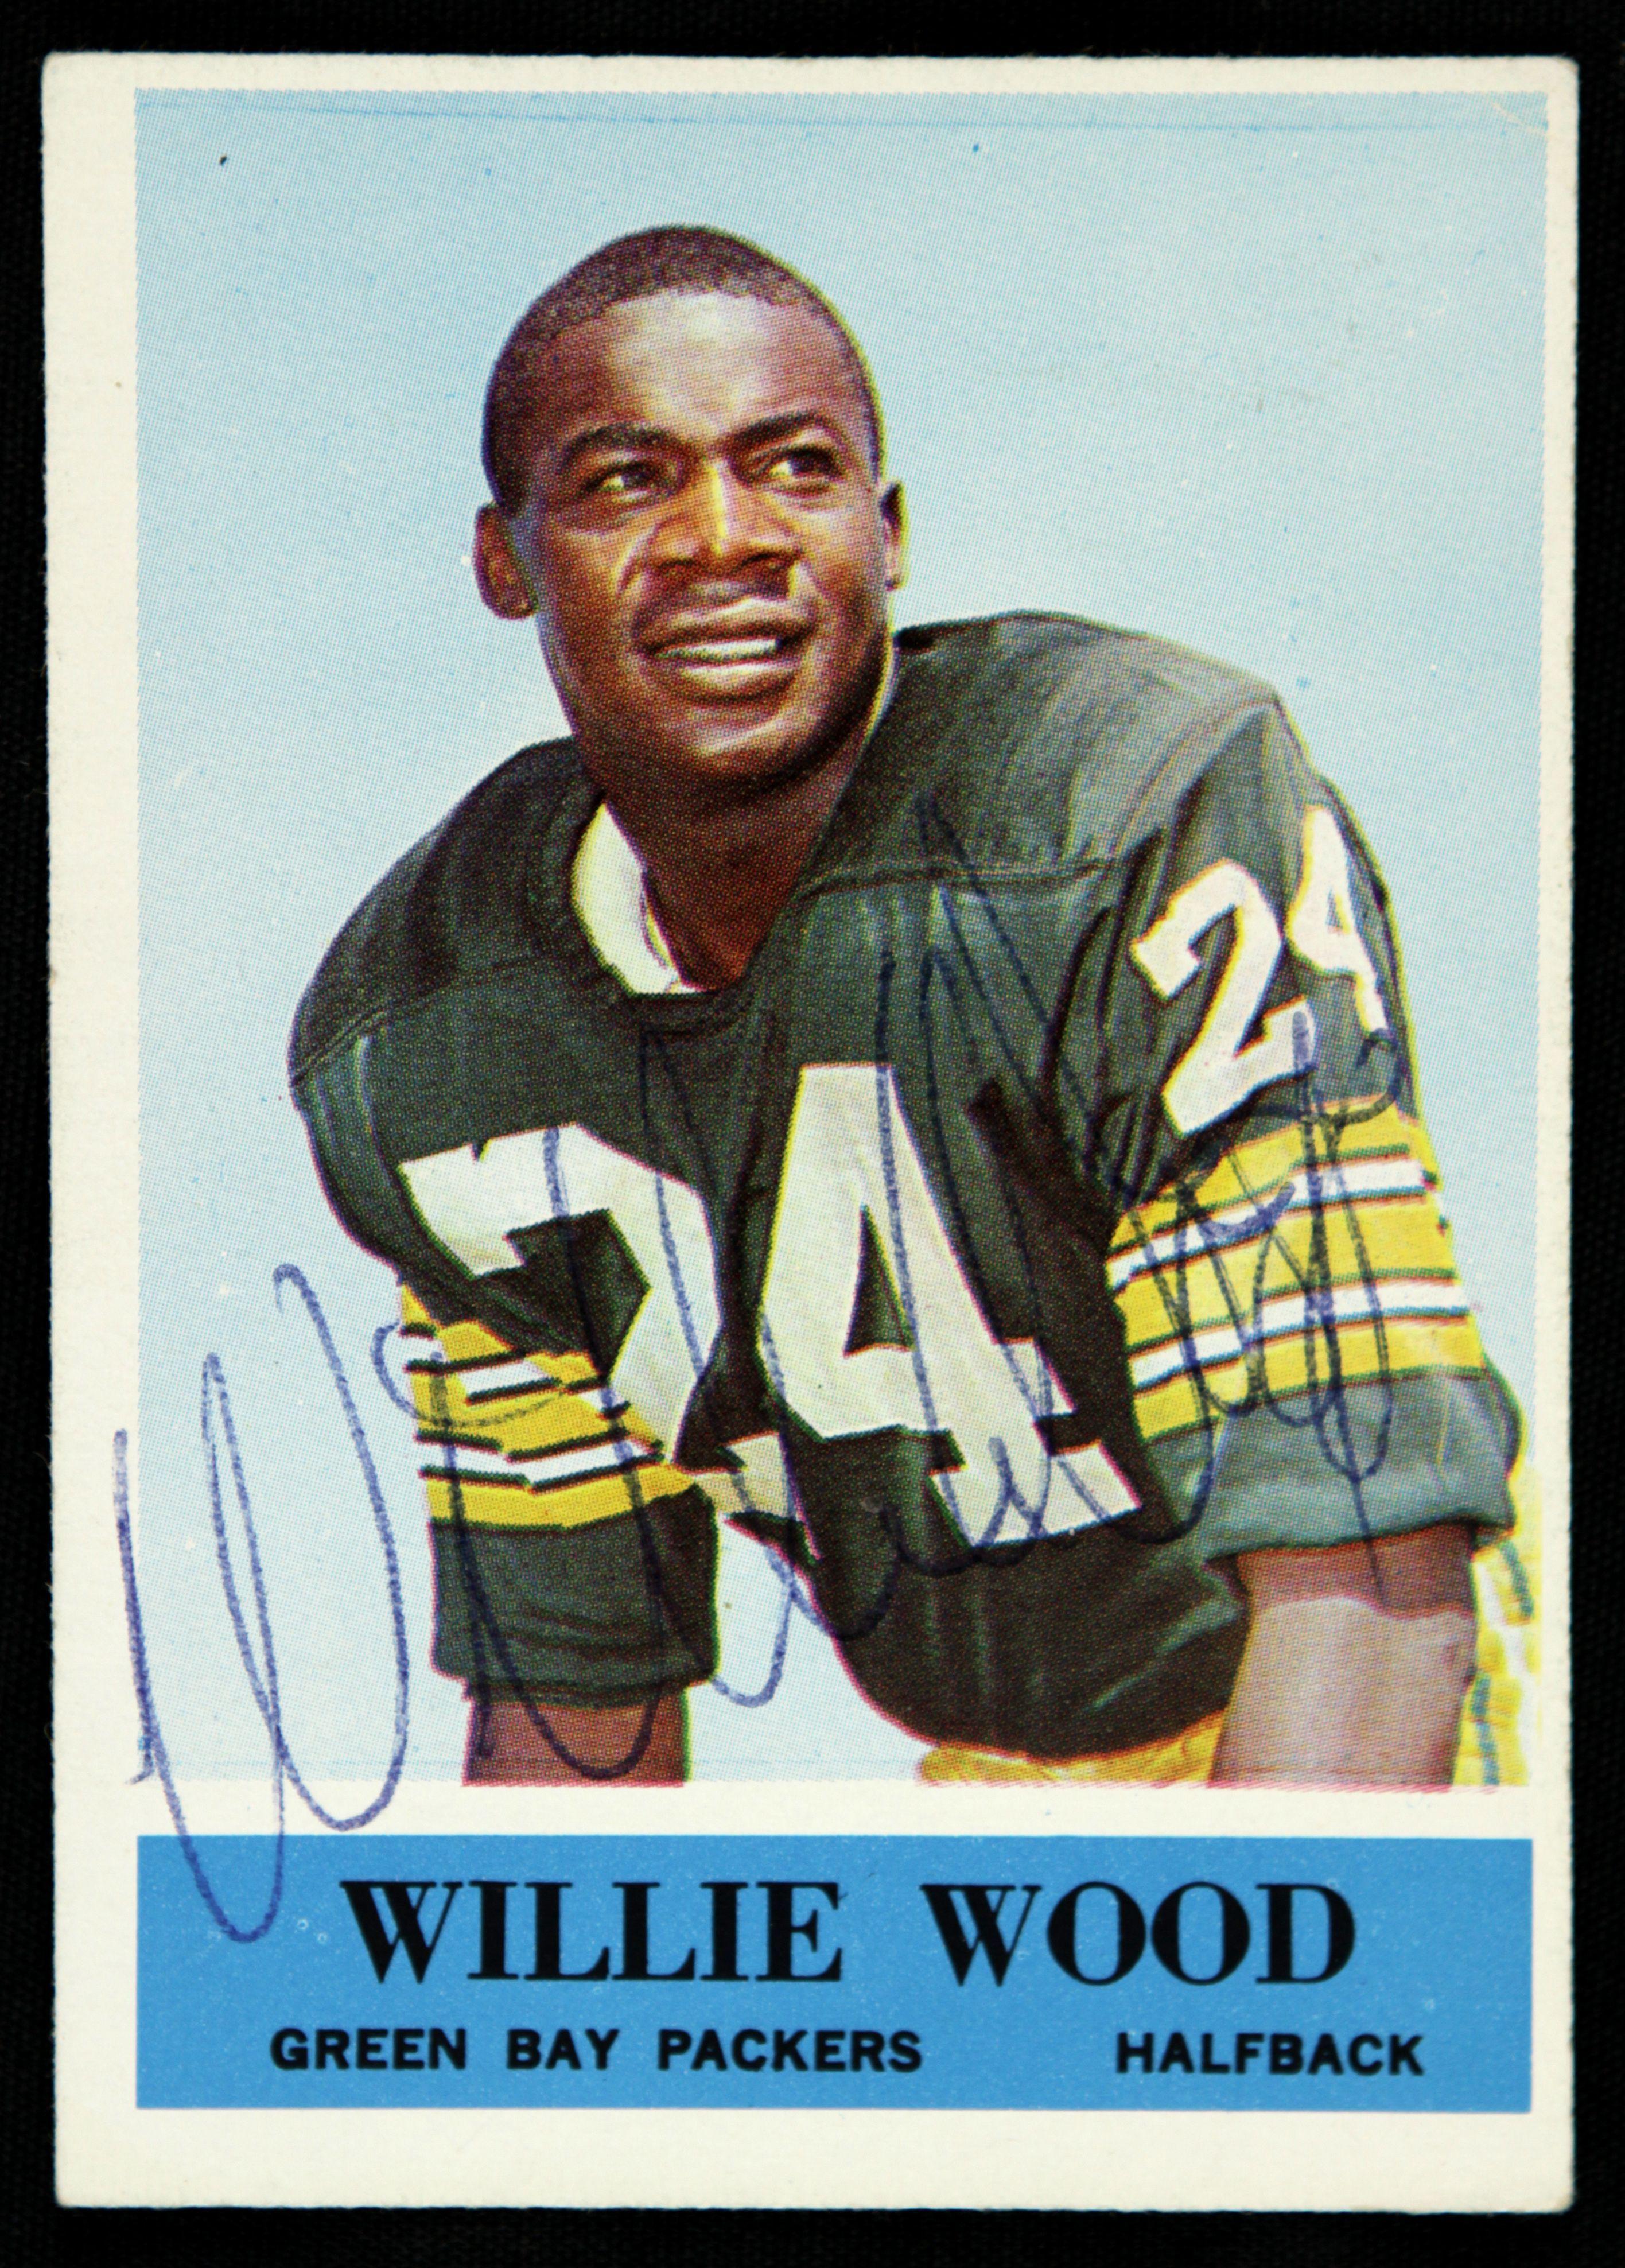 Signed bob mason picture 8x10 jsa view all bob mason - Willie Wood Football Cards 1964 Philadelphia Willie Wood Green Bay Packers Signed Card Jsa